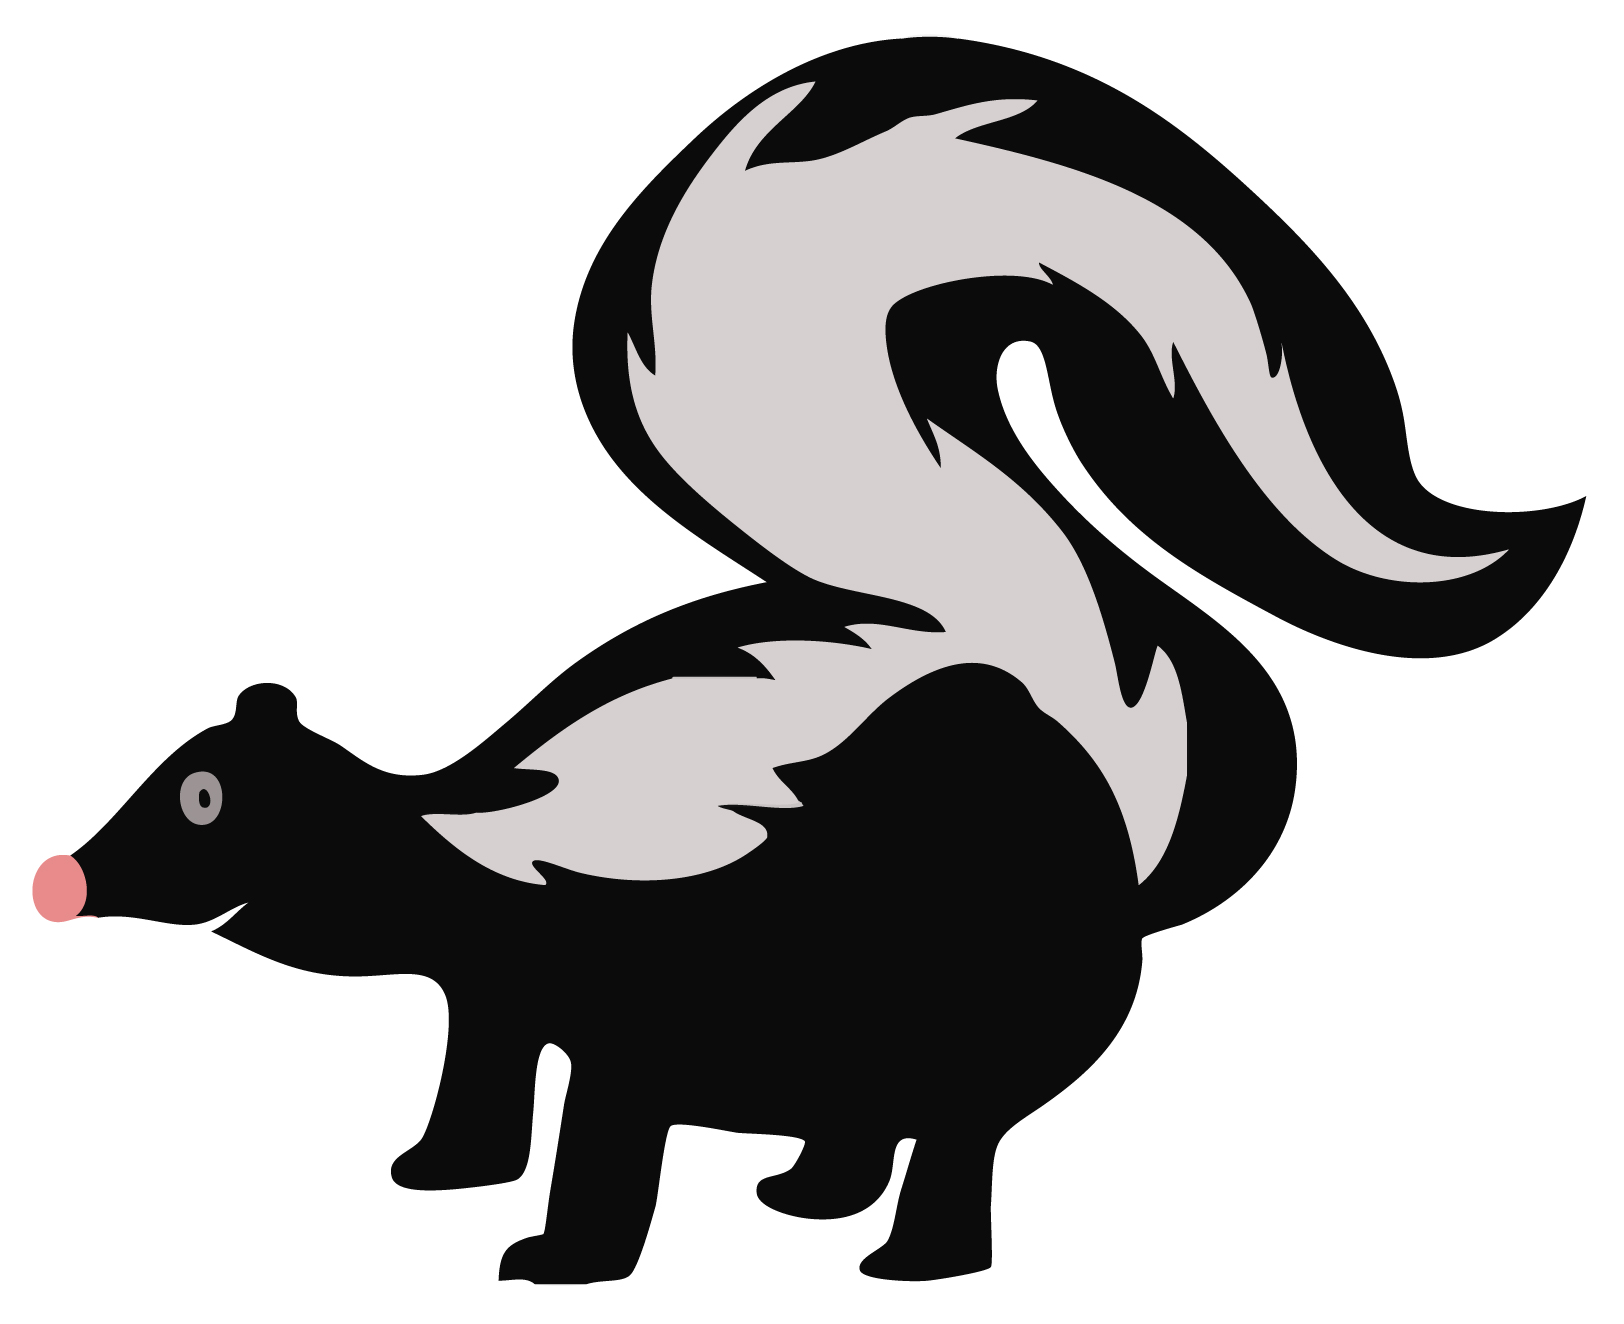 skunk clipart clipart panda free clipart images rh clipartpanda com skunk clip art free skunk clipart png